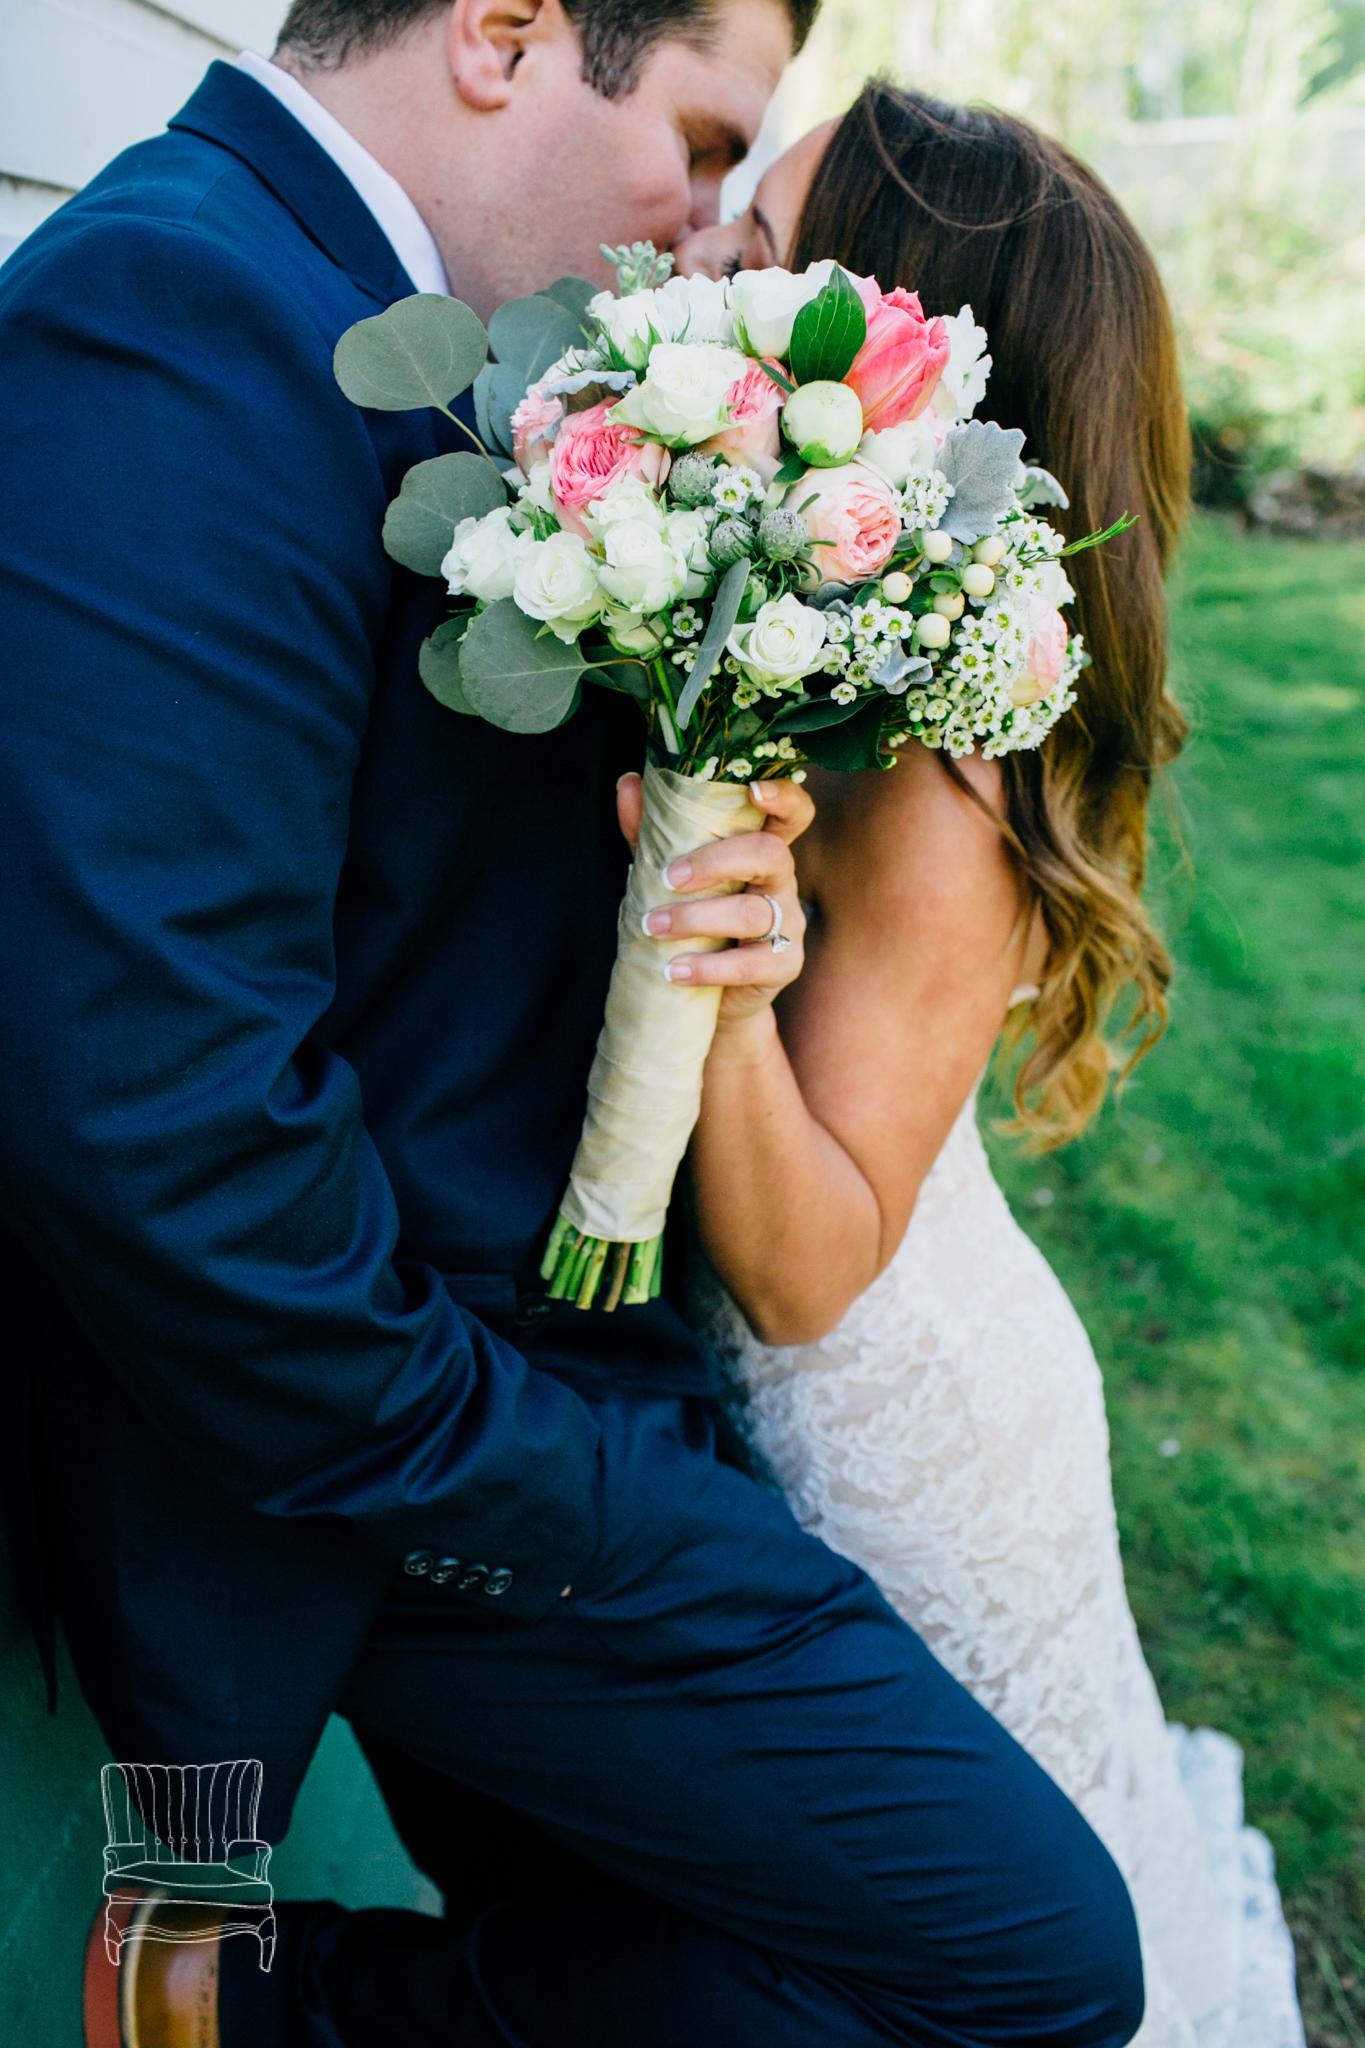 seattle-wedding-photographer-katheryn-moran-russells-bothell-wilkins-wedding-photo-29.jpg